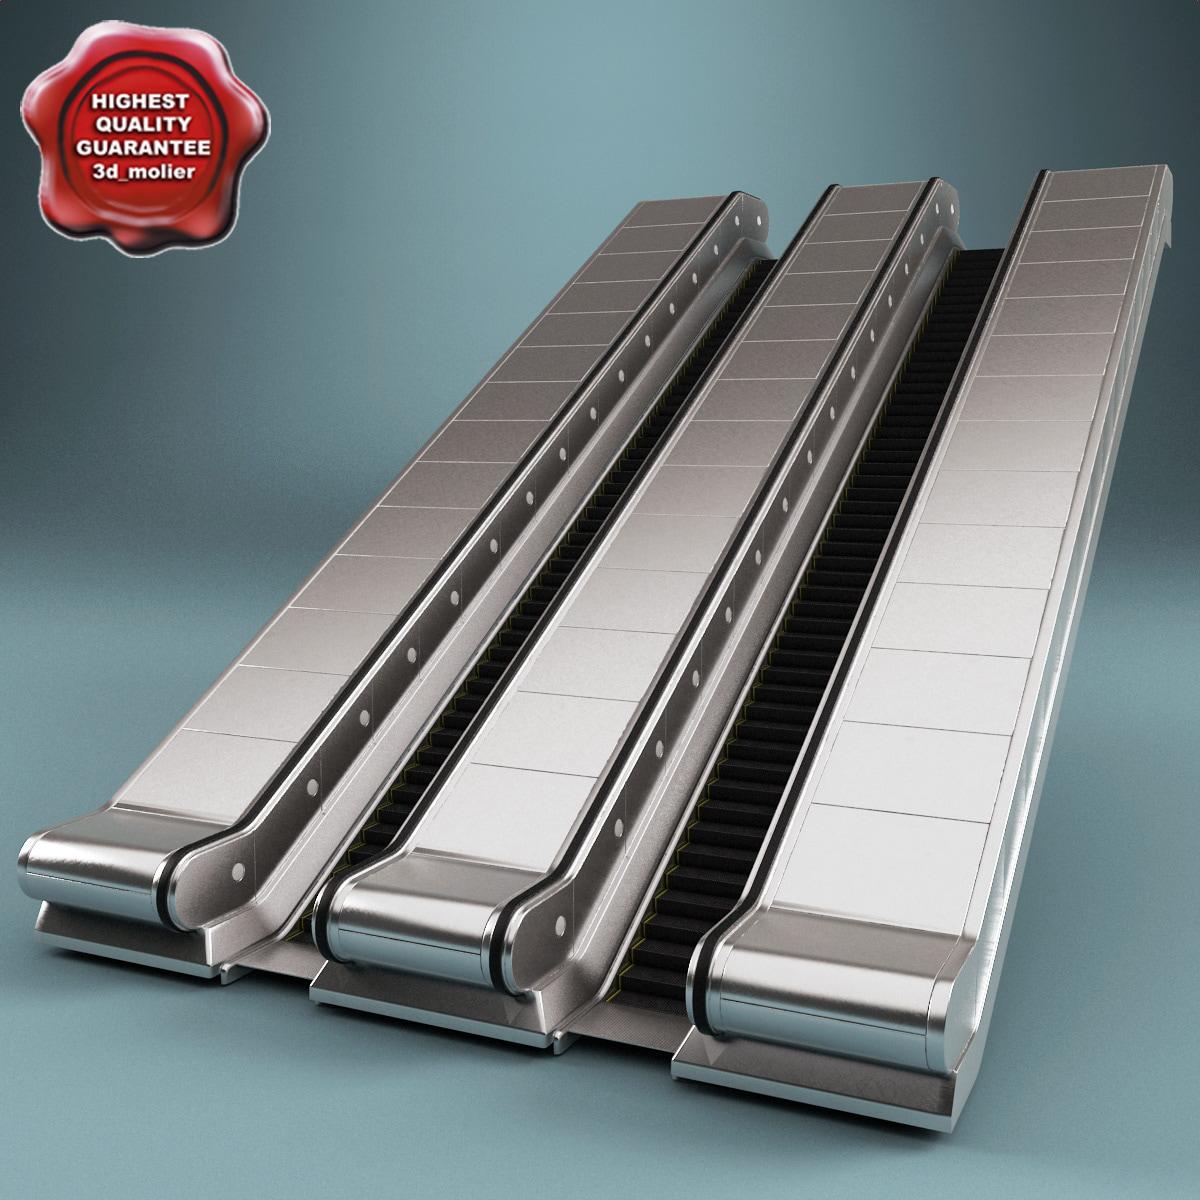 3d model escalator v2